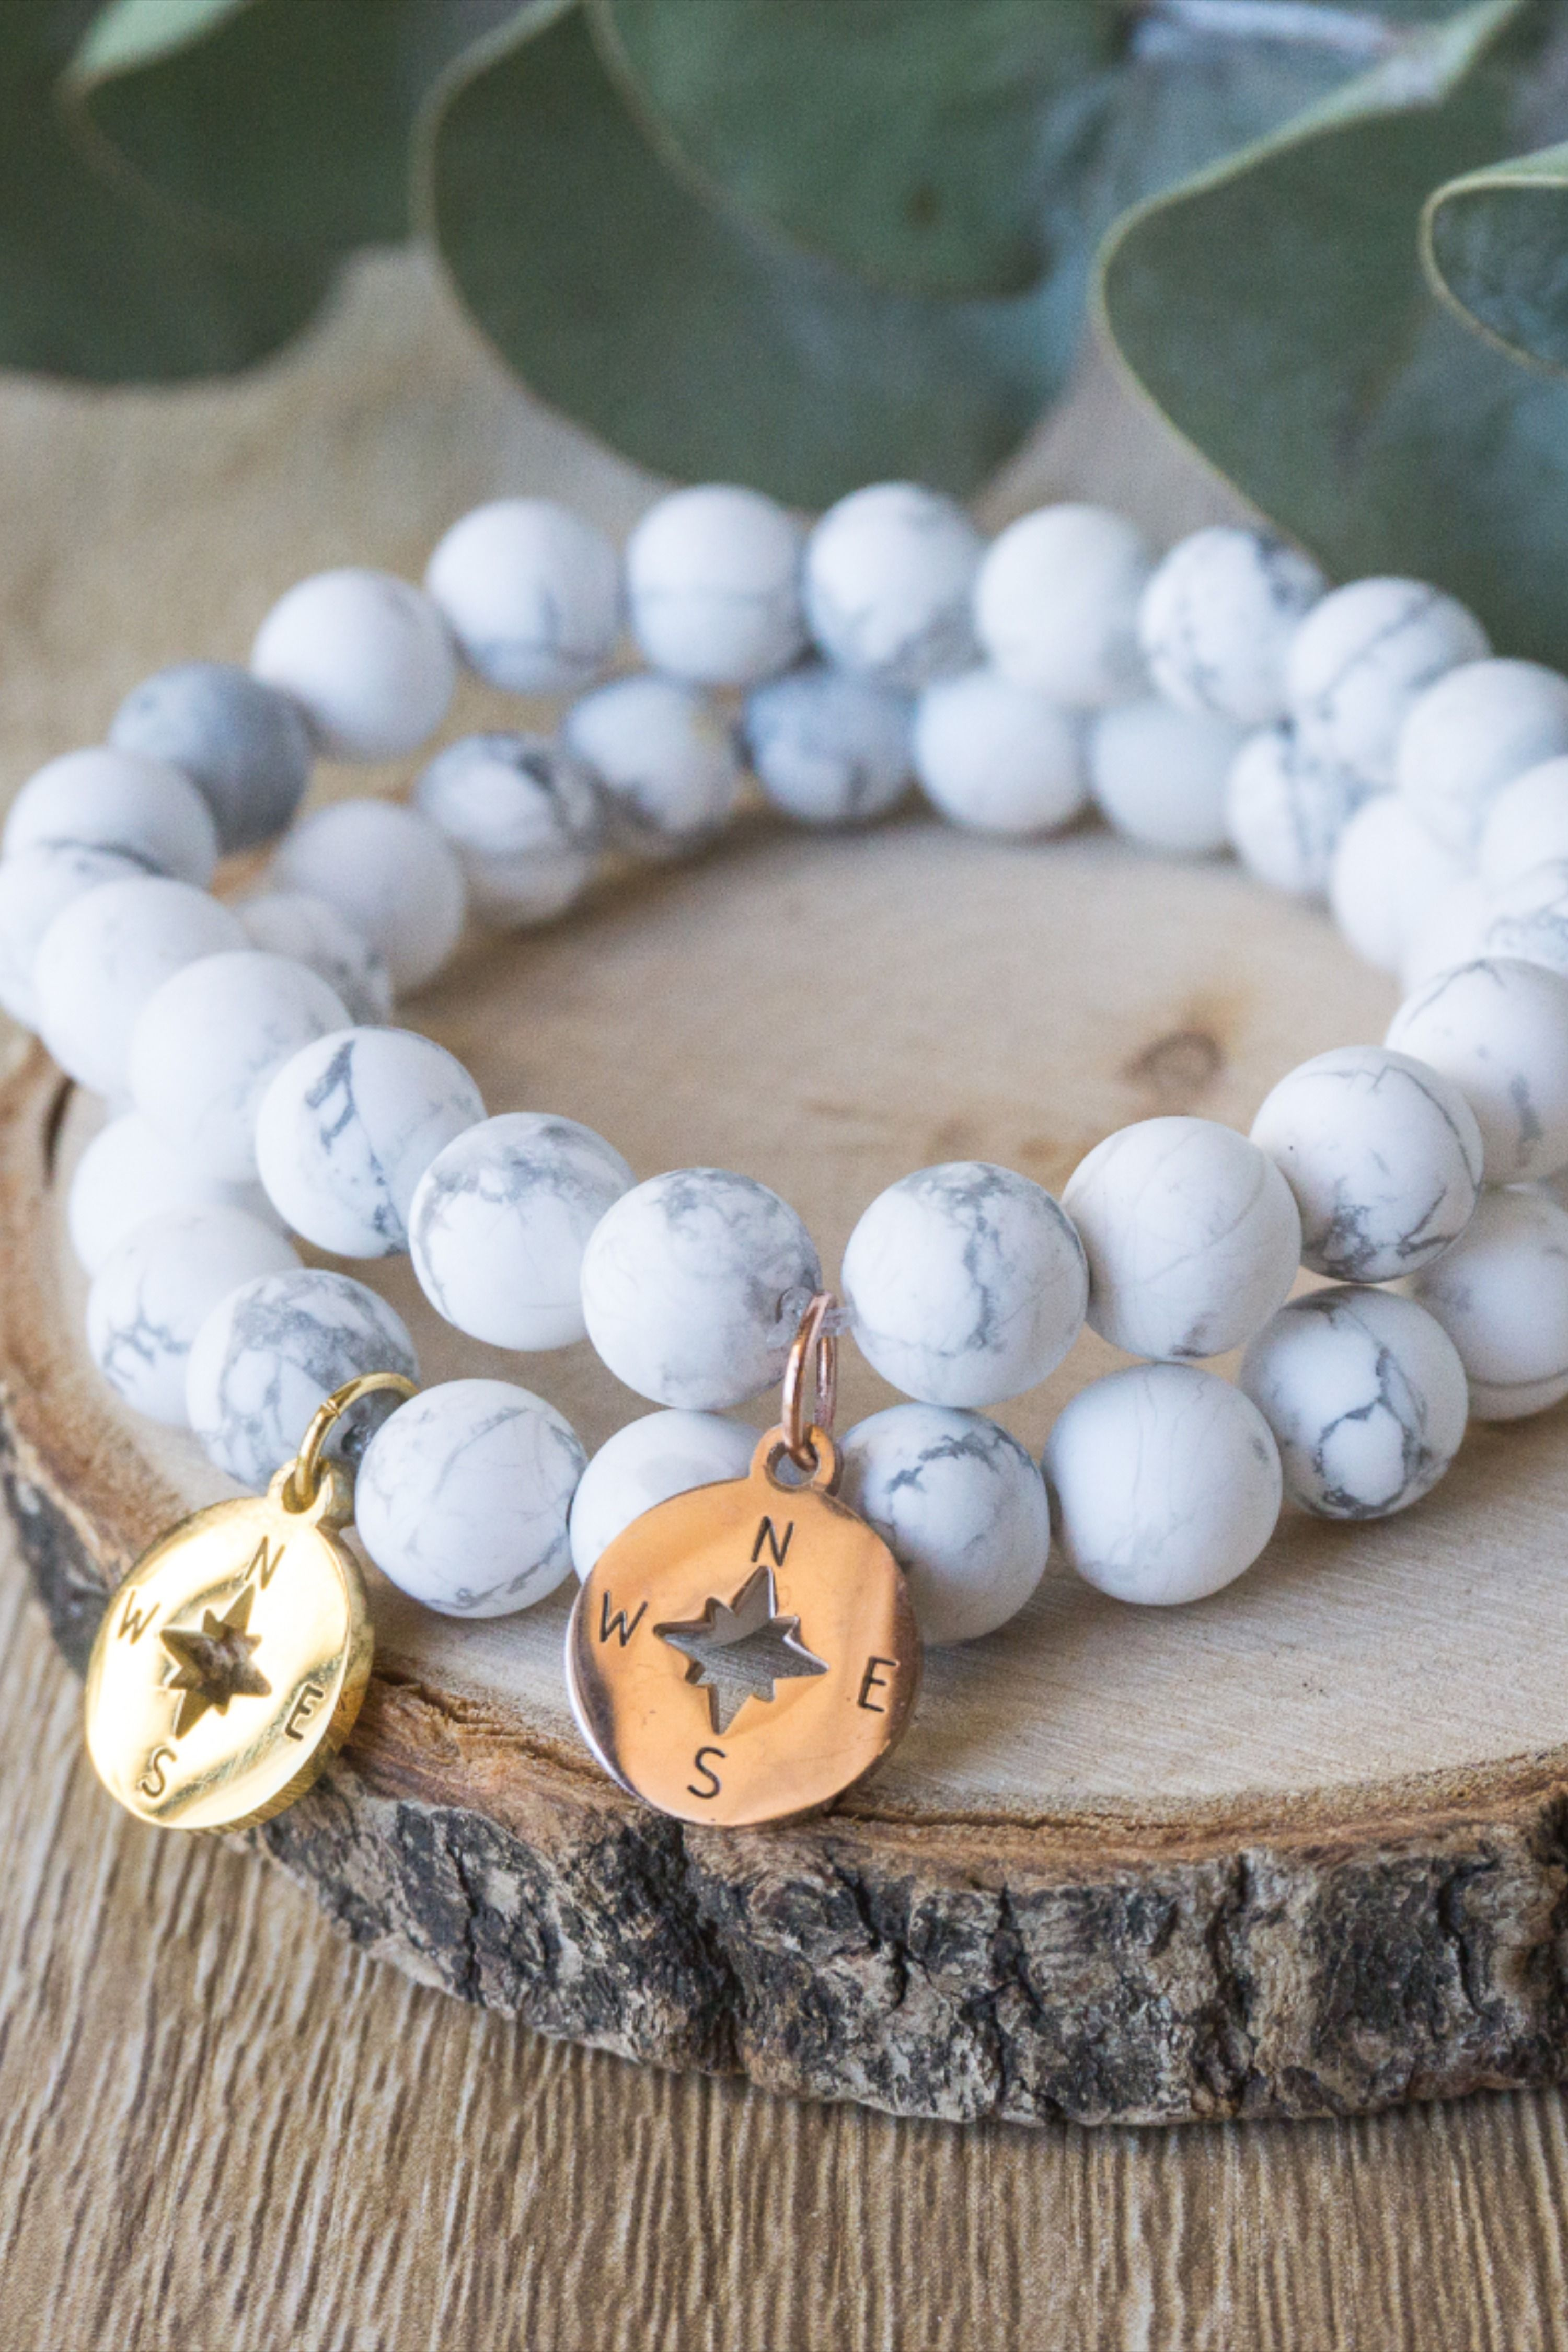 gifts woman gift labradorite and semi-precious stones Boho woman bracelet